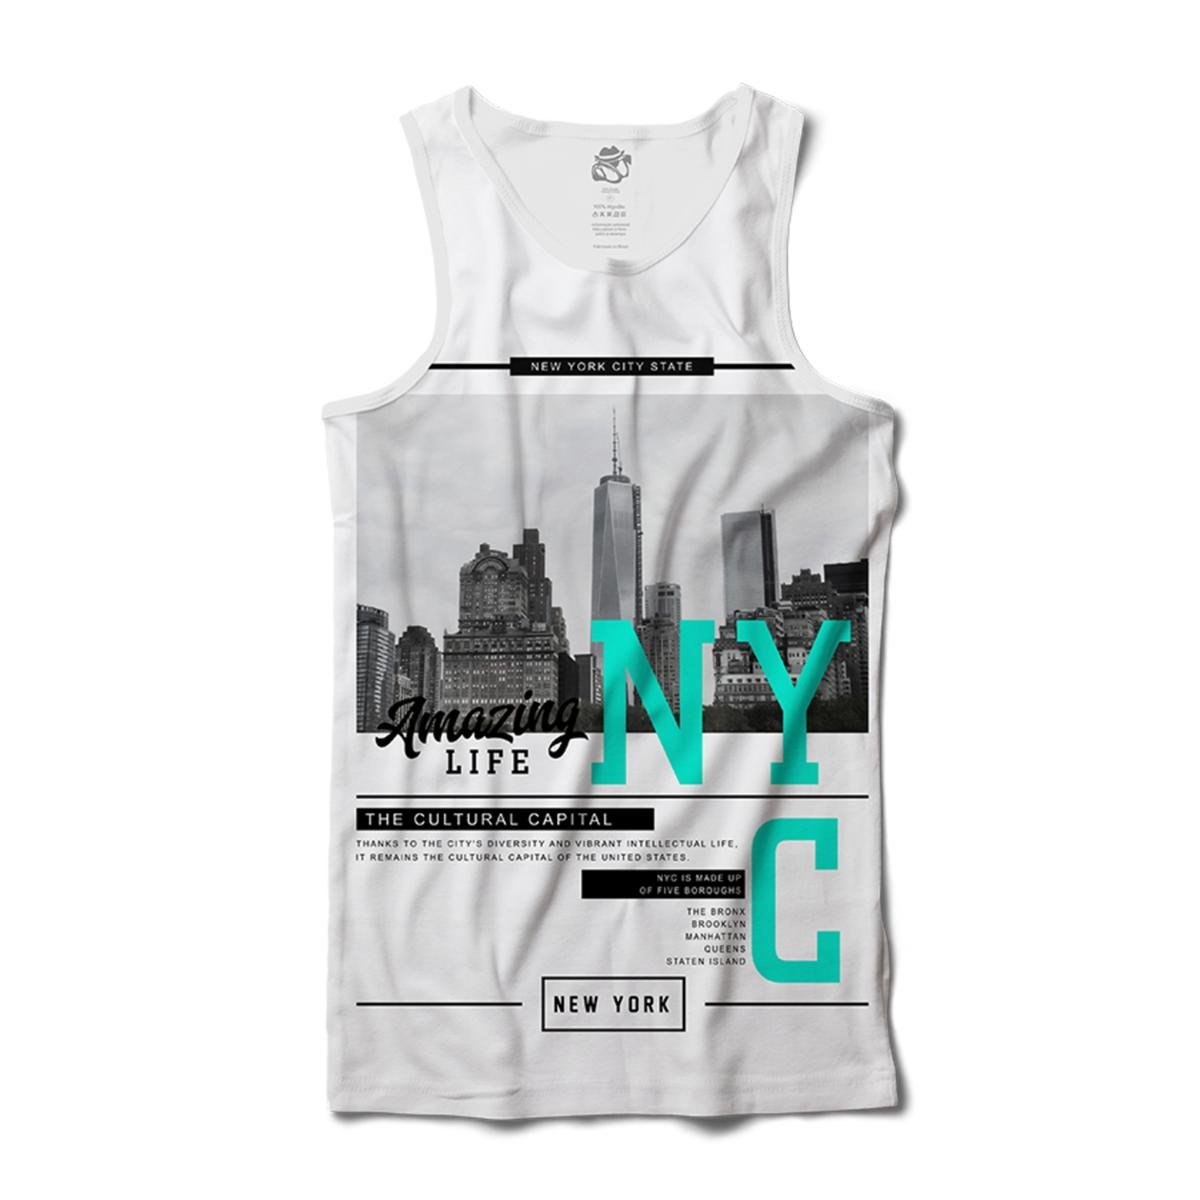 672938eb9 Regata BSC New York Capital da Cultura Sublimada Masculina - Compre ...